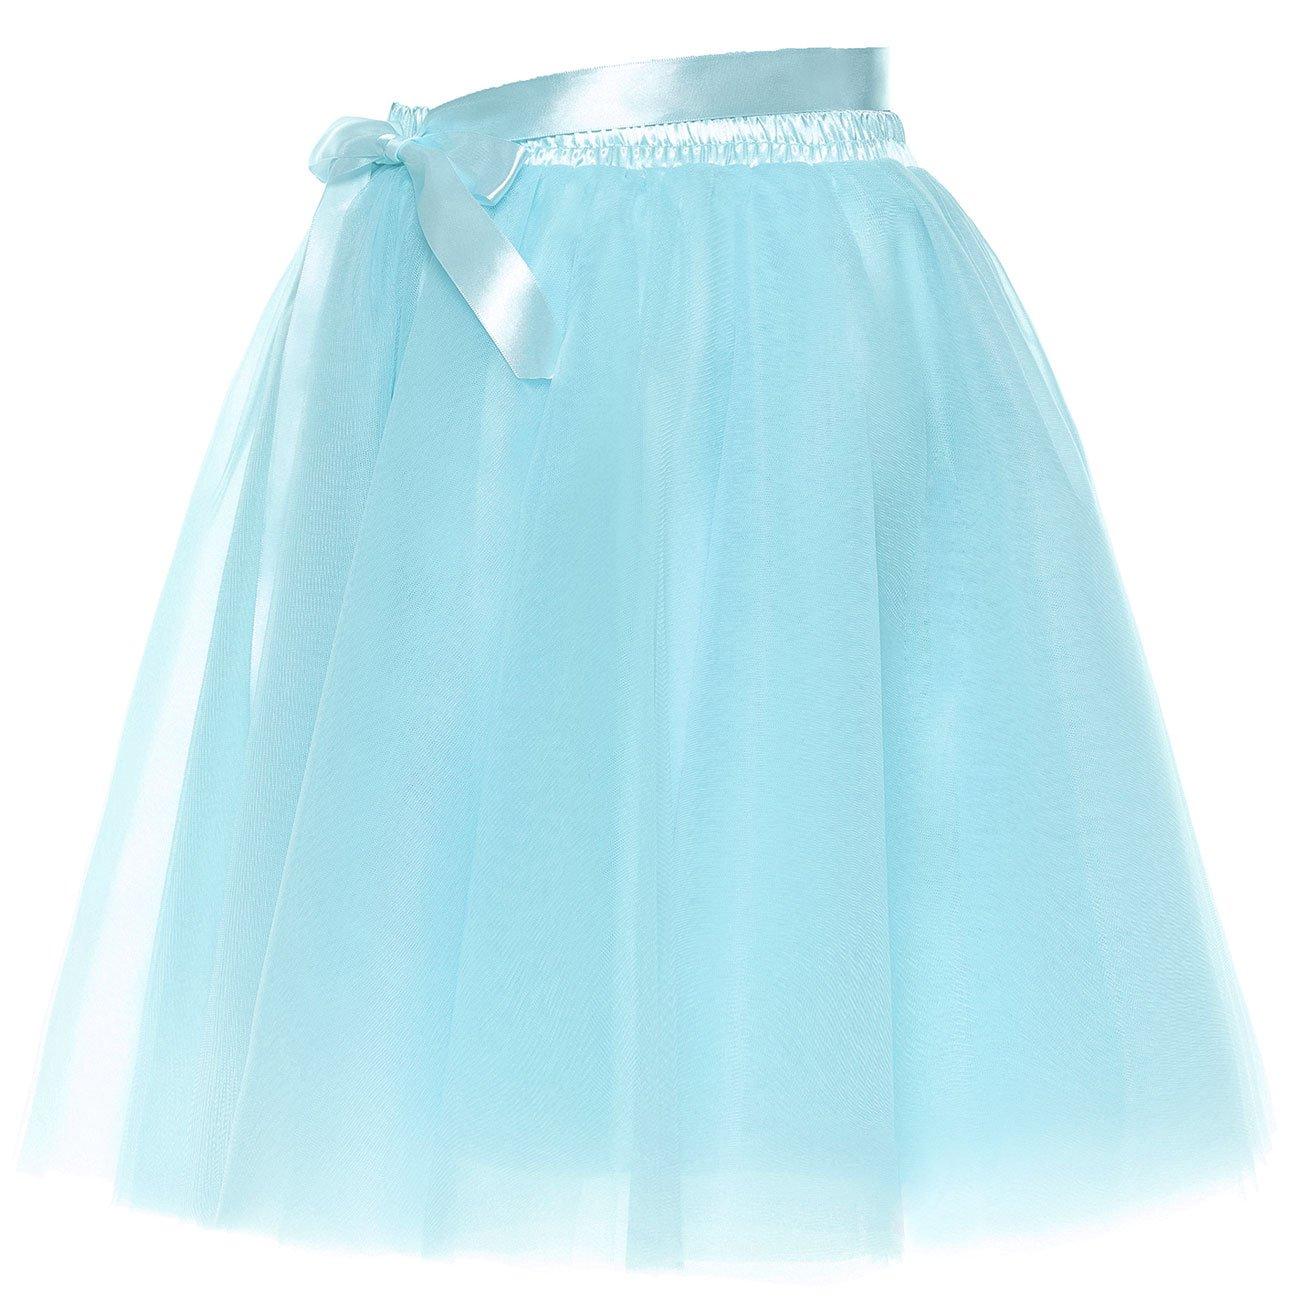 9388c217d5849a BeiQianE Frauen Kurze Bowknot überlagert Tüll Petticoat Slip Party ...